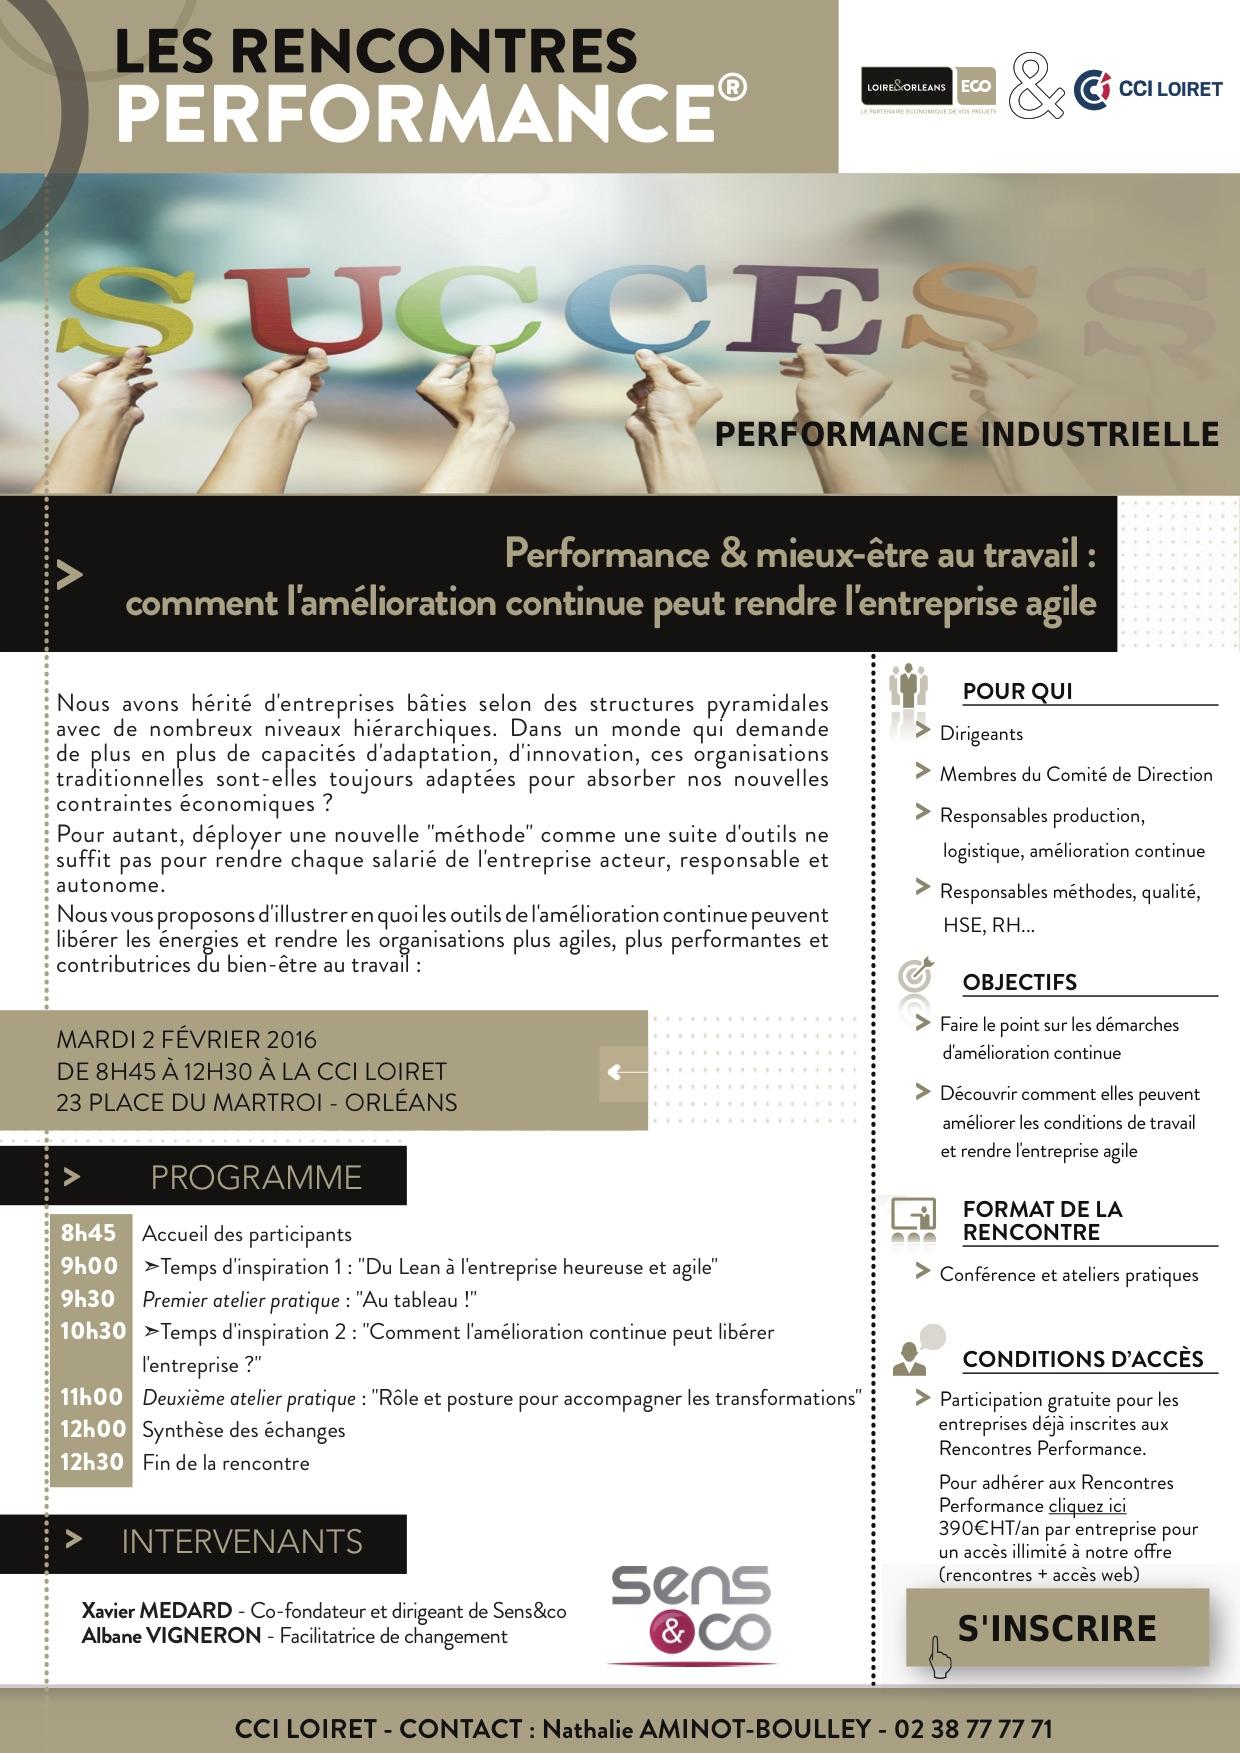 Programme-02-02-2016-entreprise-agile